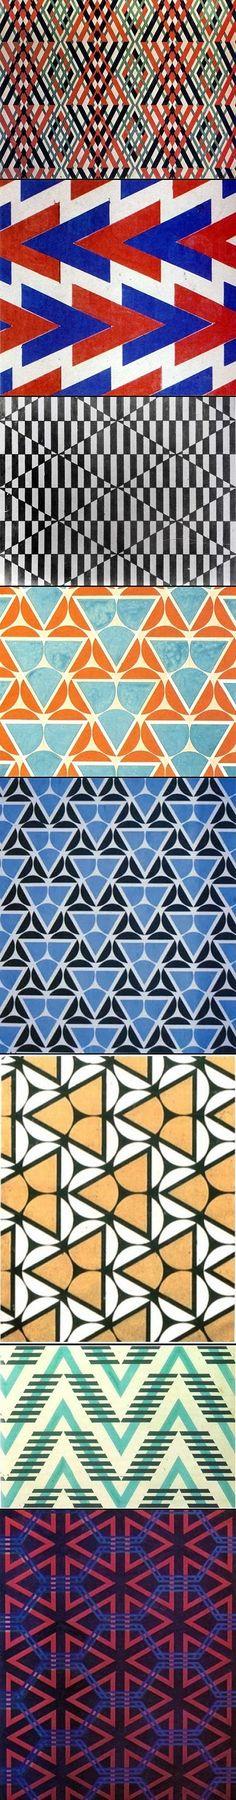 Textile designs by my icon Varvara Stepanova